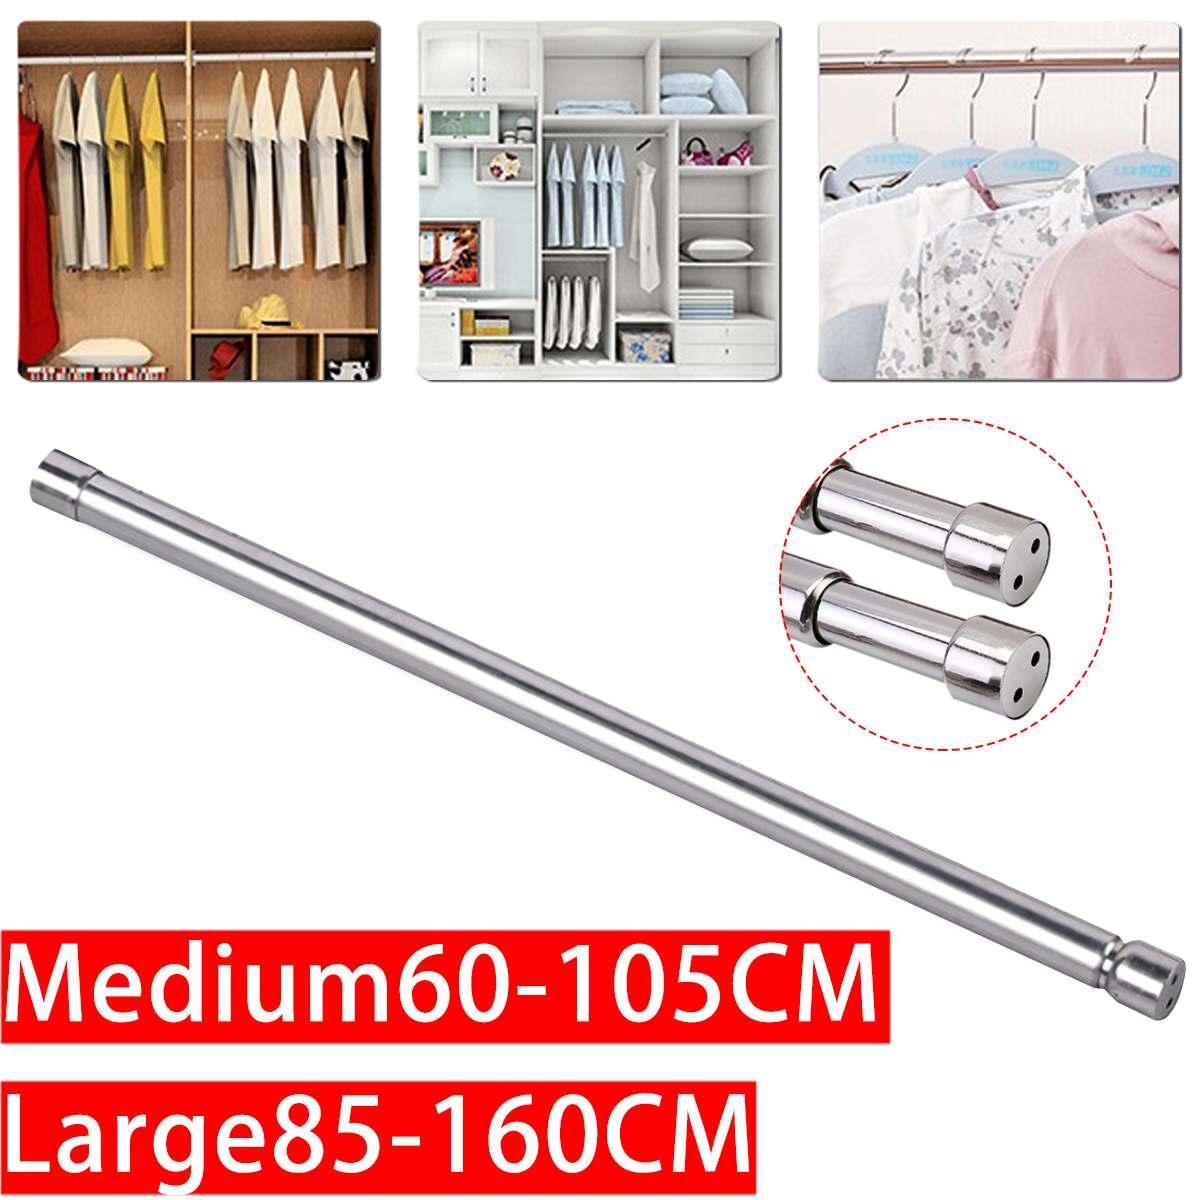 Telescopic Tension Extendable Curtain Window Shower Hanger Closet Hang Rod Safe